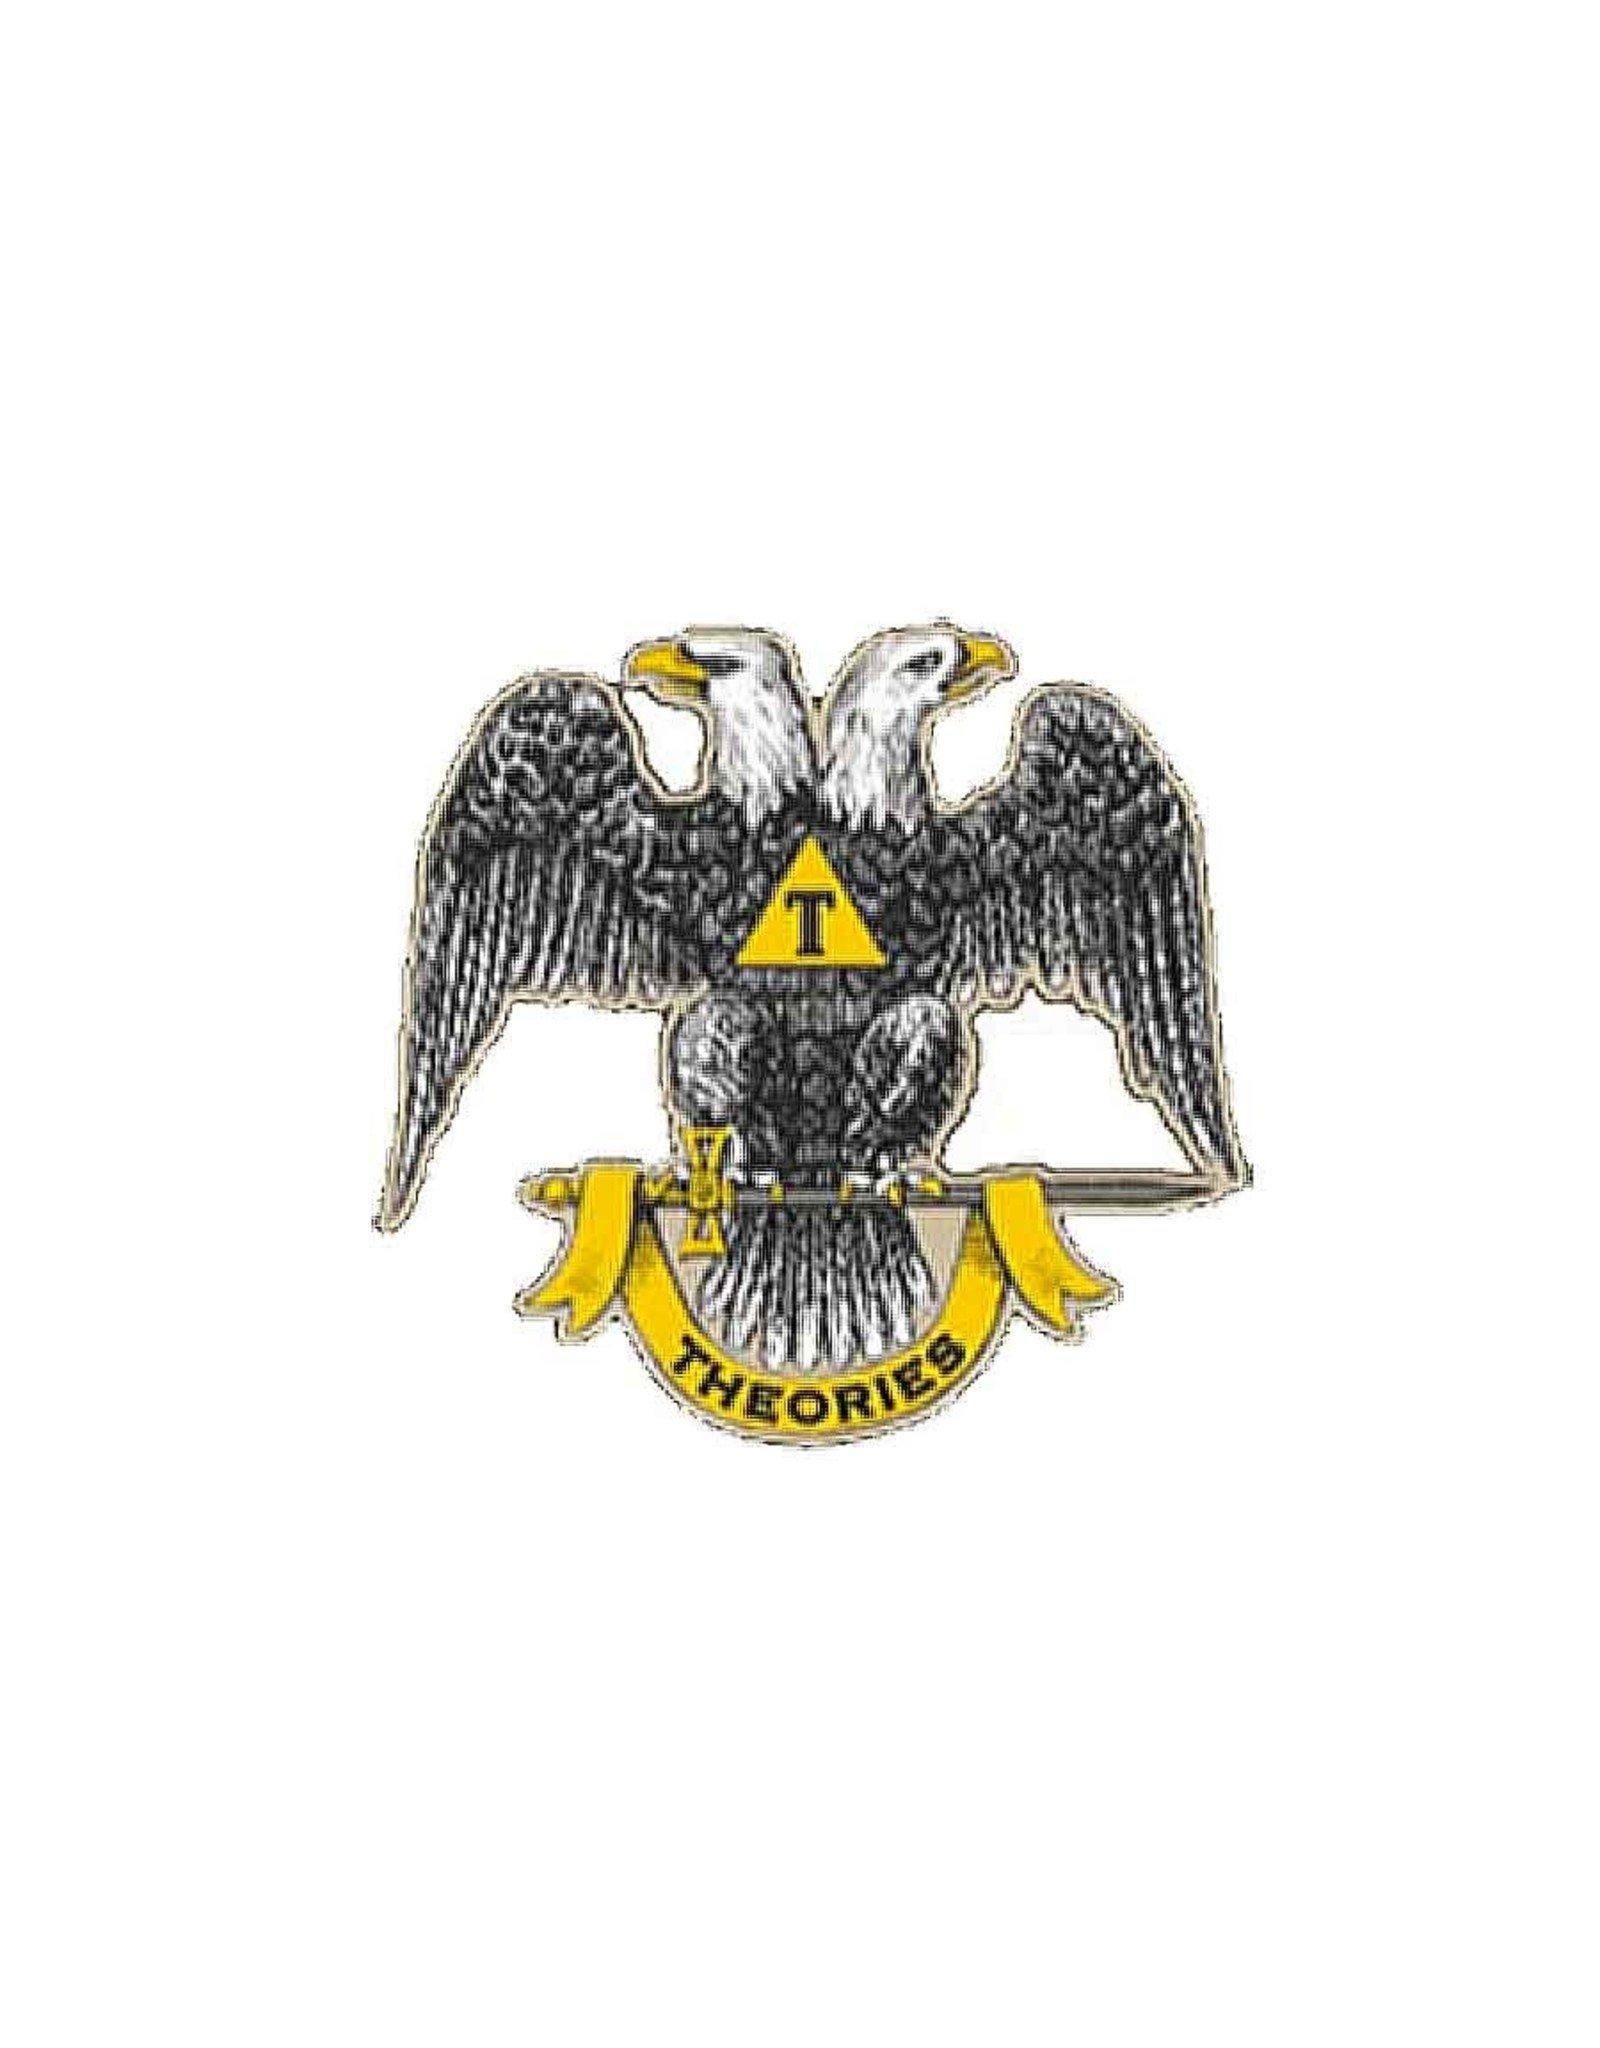 Theories Of Atlantis Theories Sticker Twin Eagle